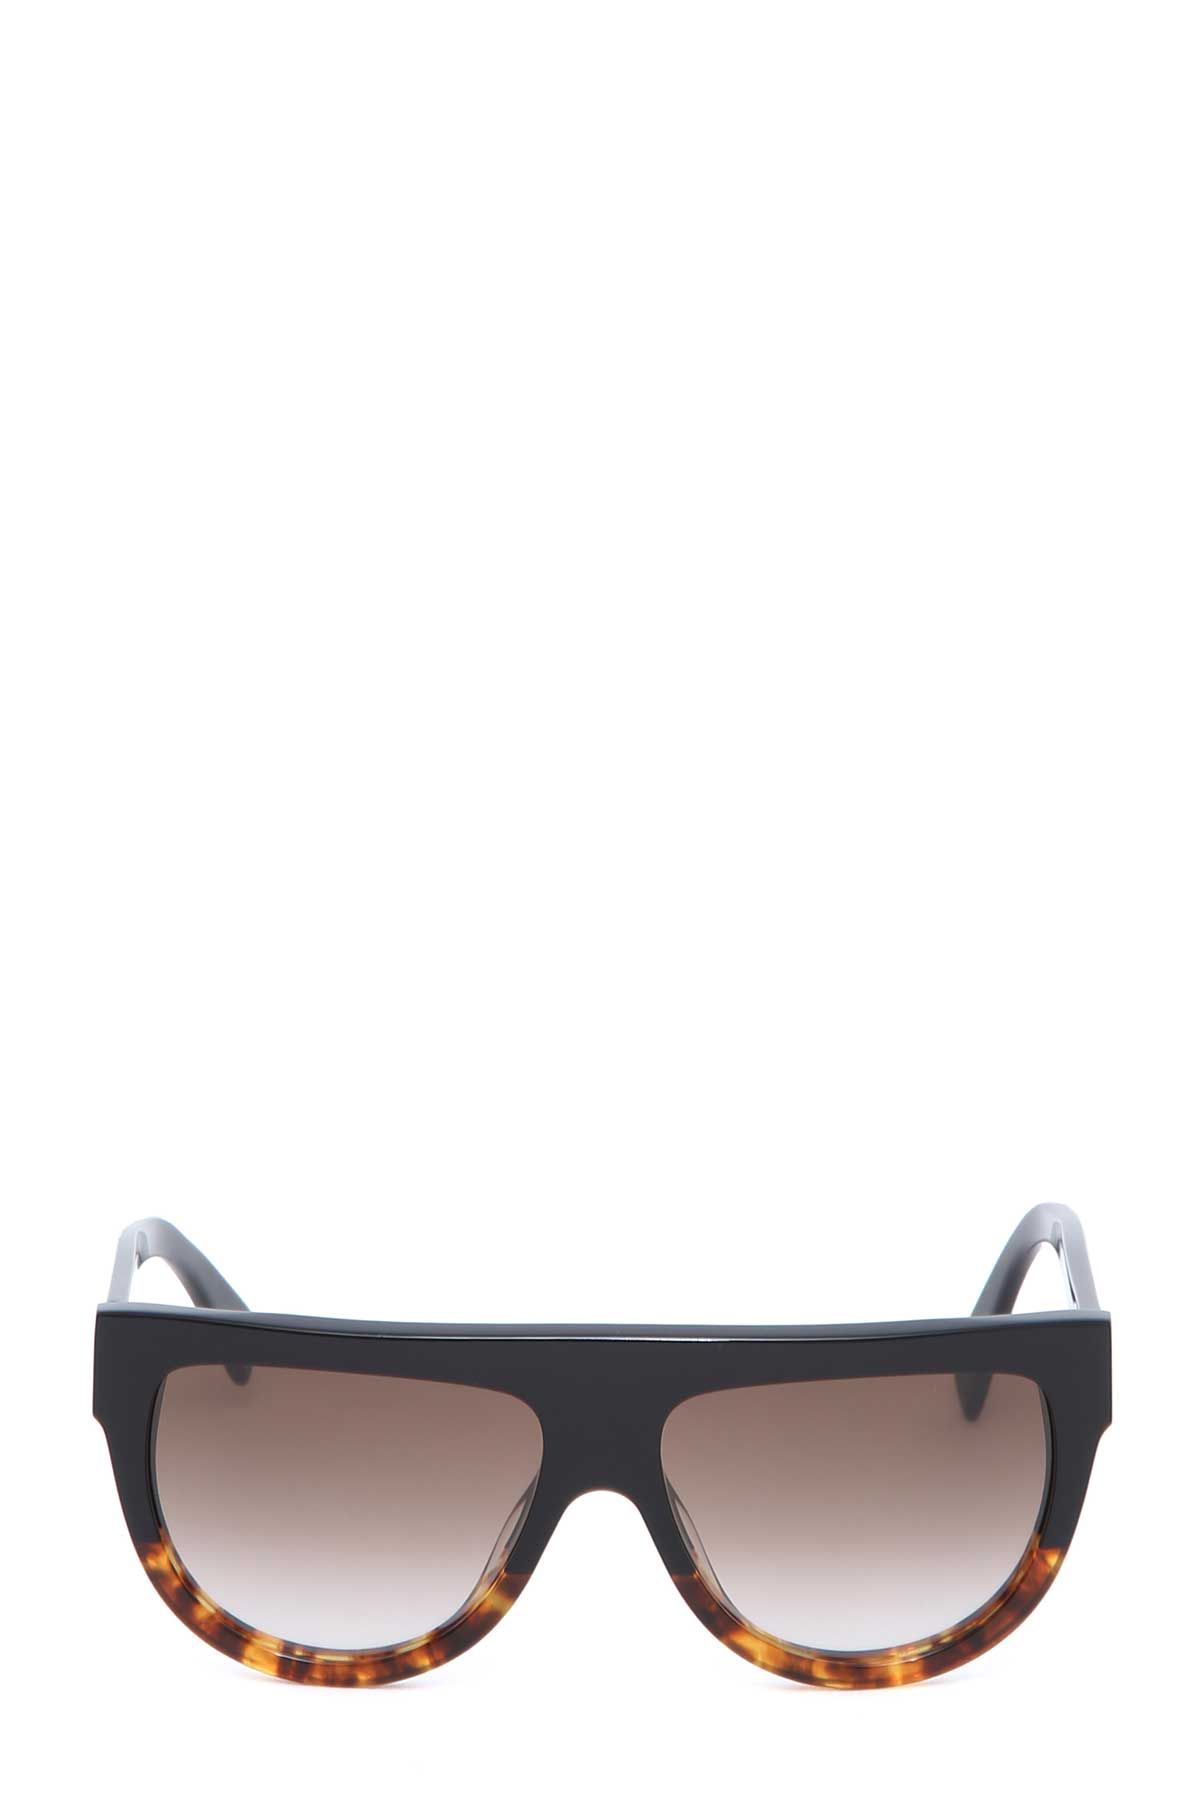 6342d7dde141f Celine Shadow Sunglasses